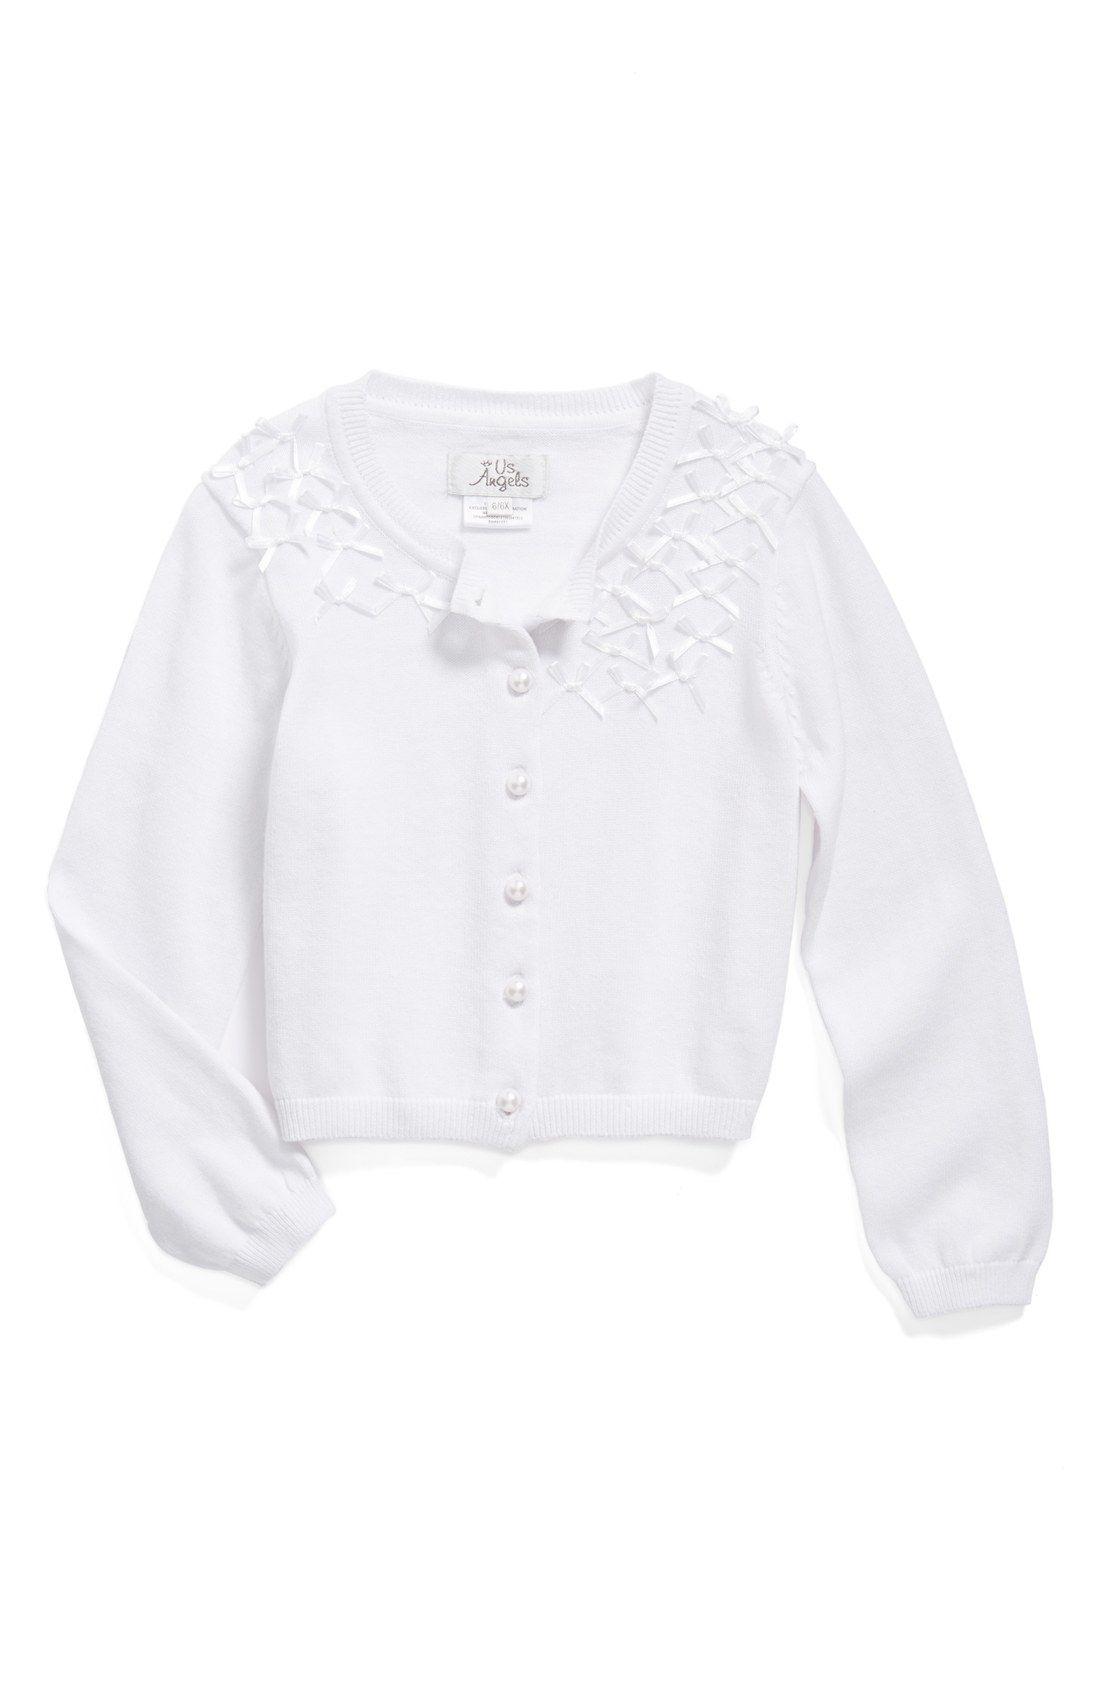 Communion Cardigan Sweater | Communion